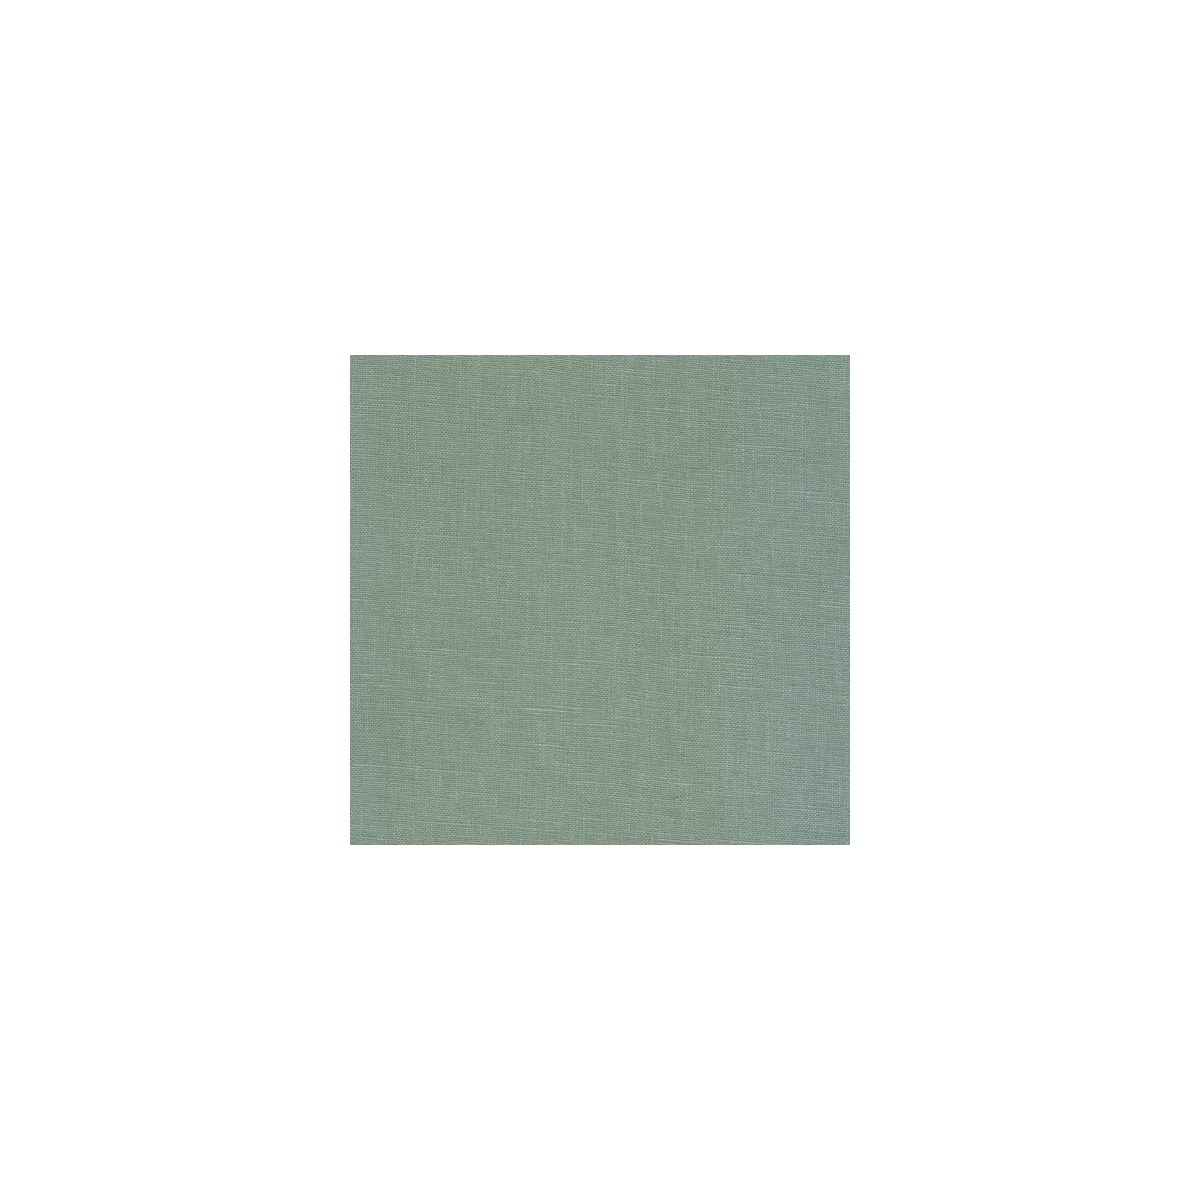 Churchill Linen * - Blue Mist - Fabric By the Yard